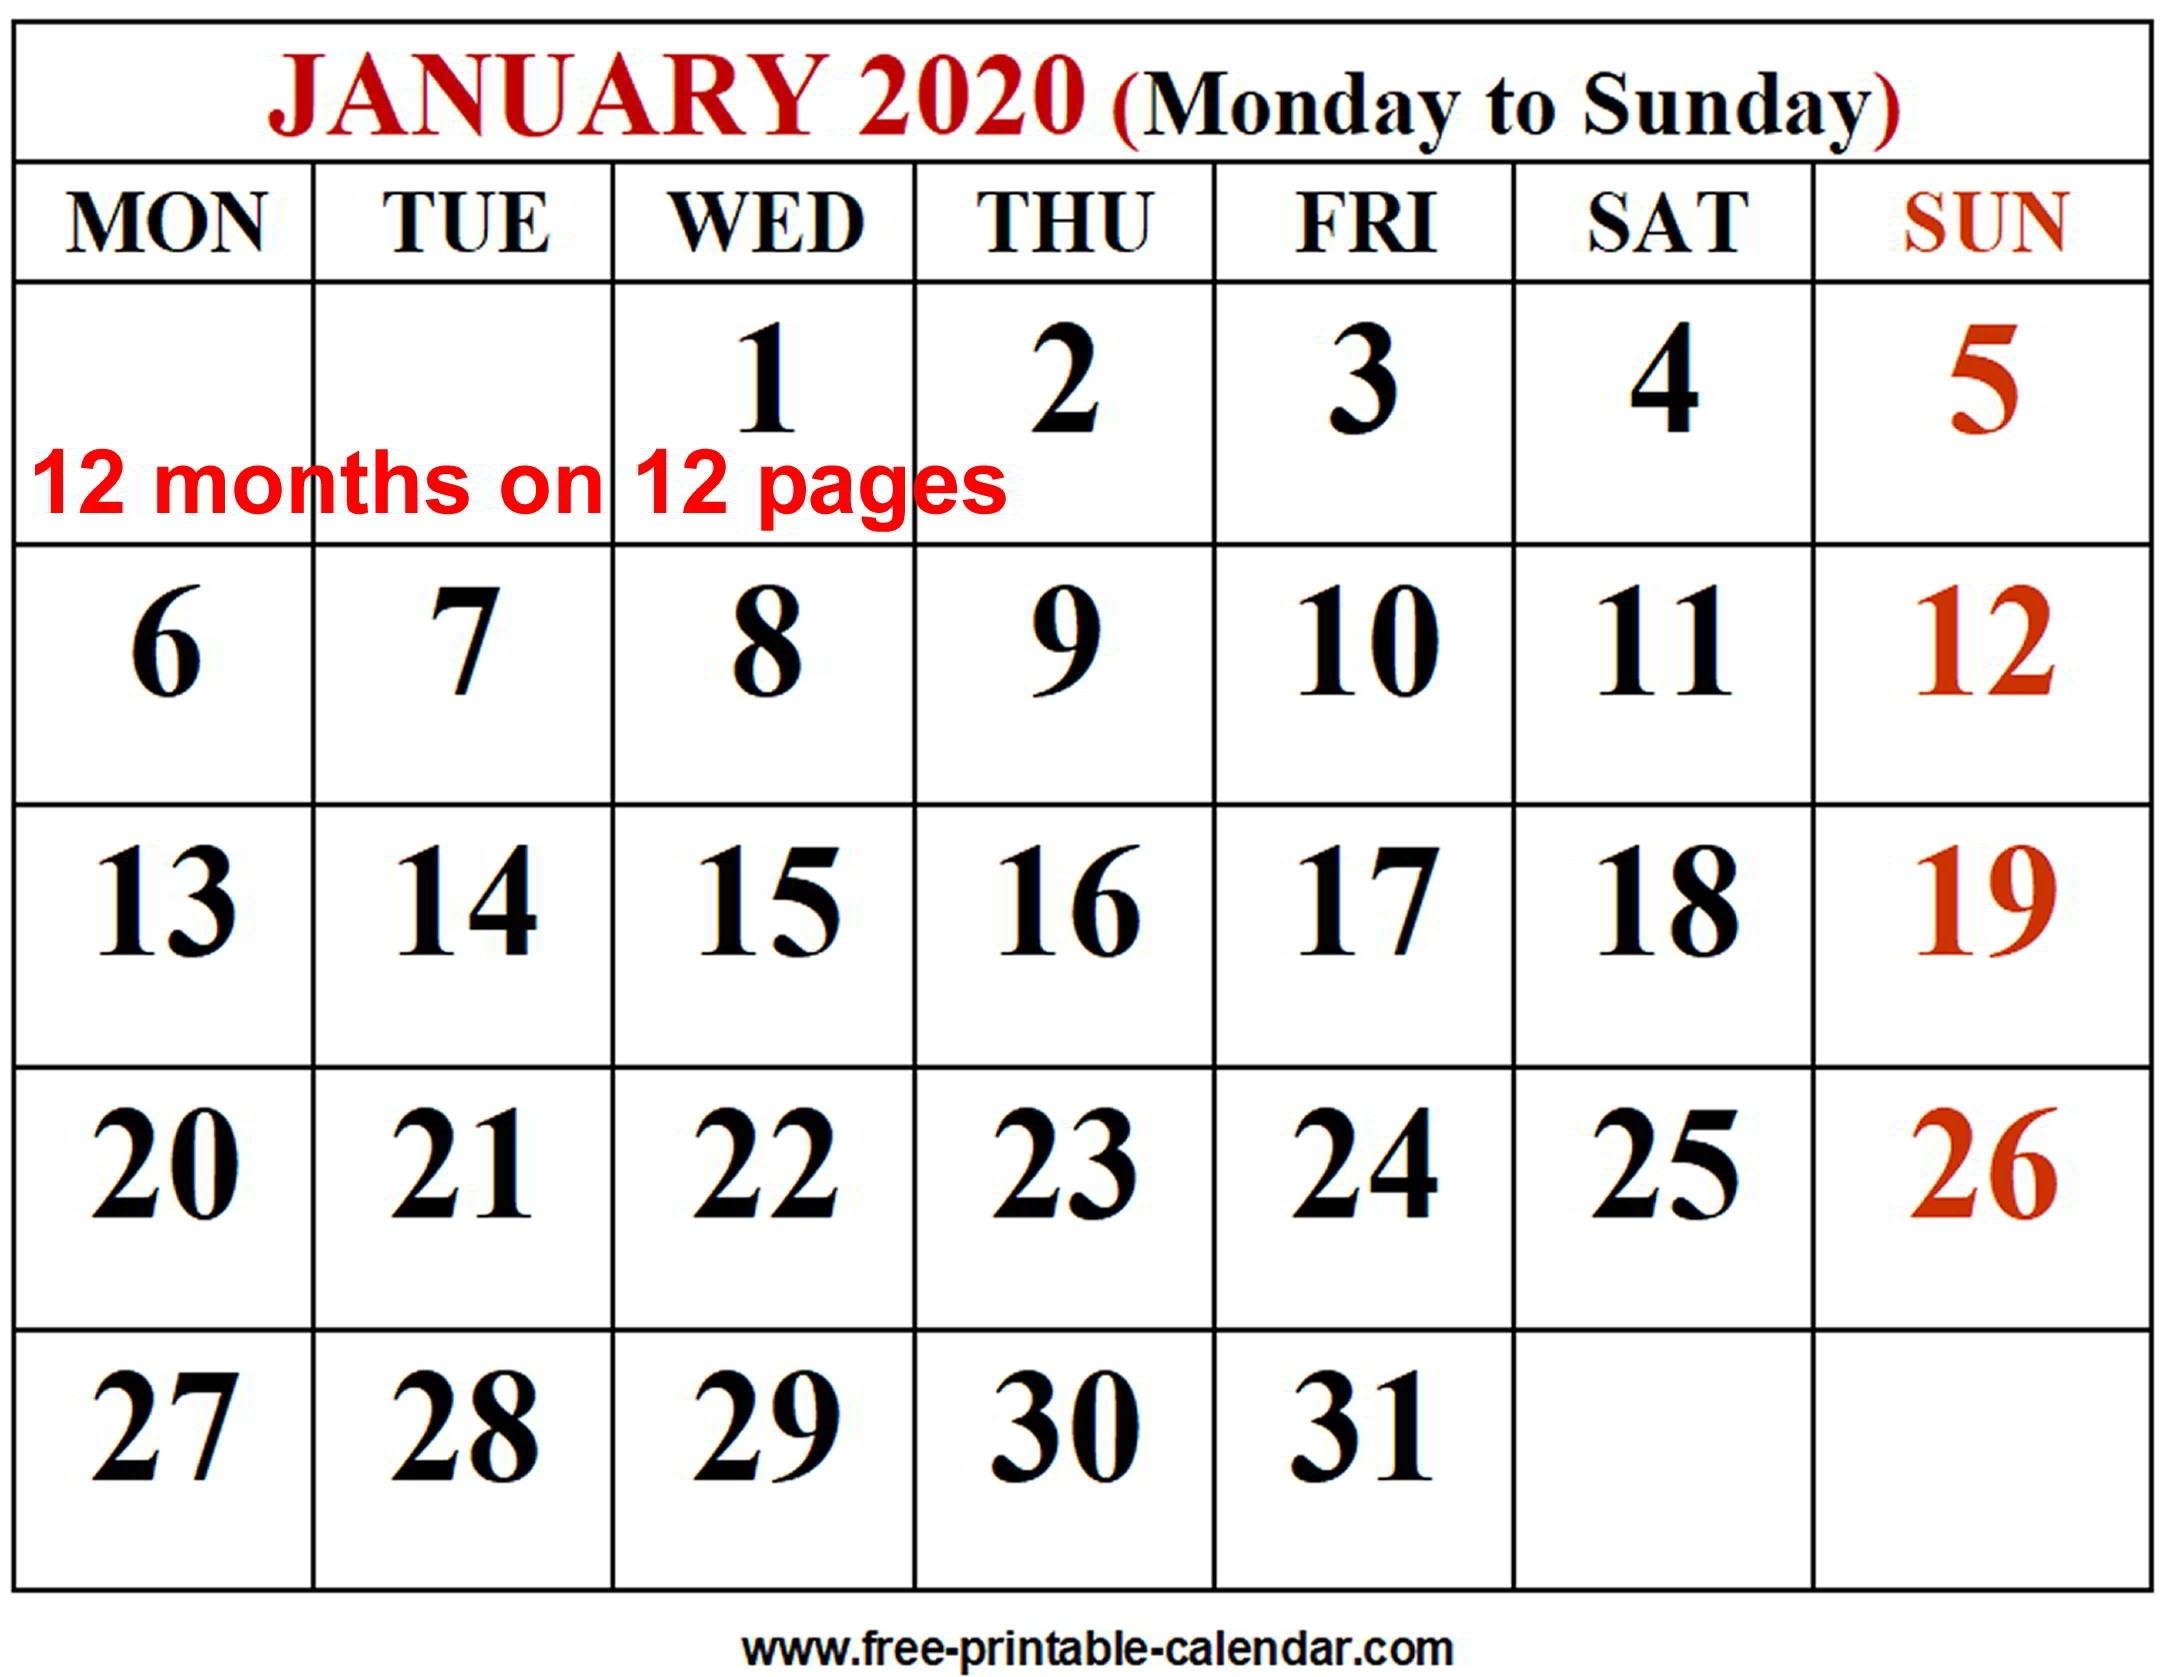 2020 Calendar Template - Free-Printable-Calendar  12 Month Calendar 2020 Printable Free